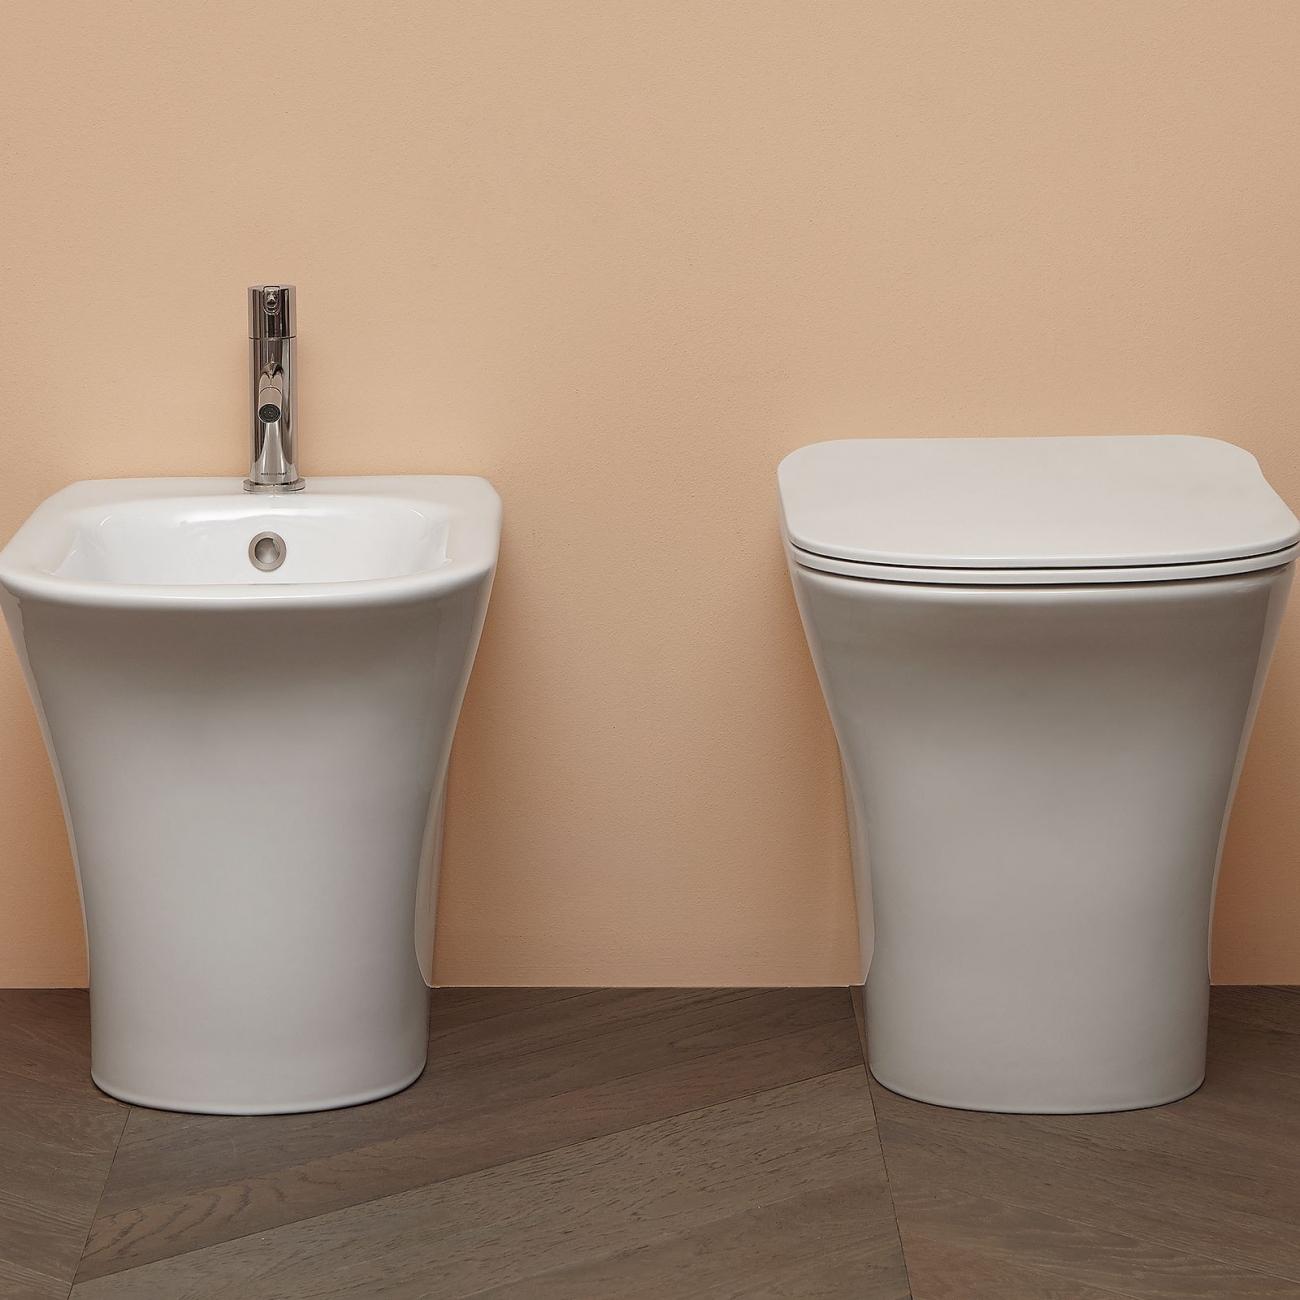 CABO21 Antonio Lupi High Gloss Ceramic Water